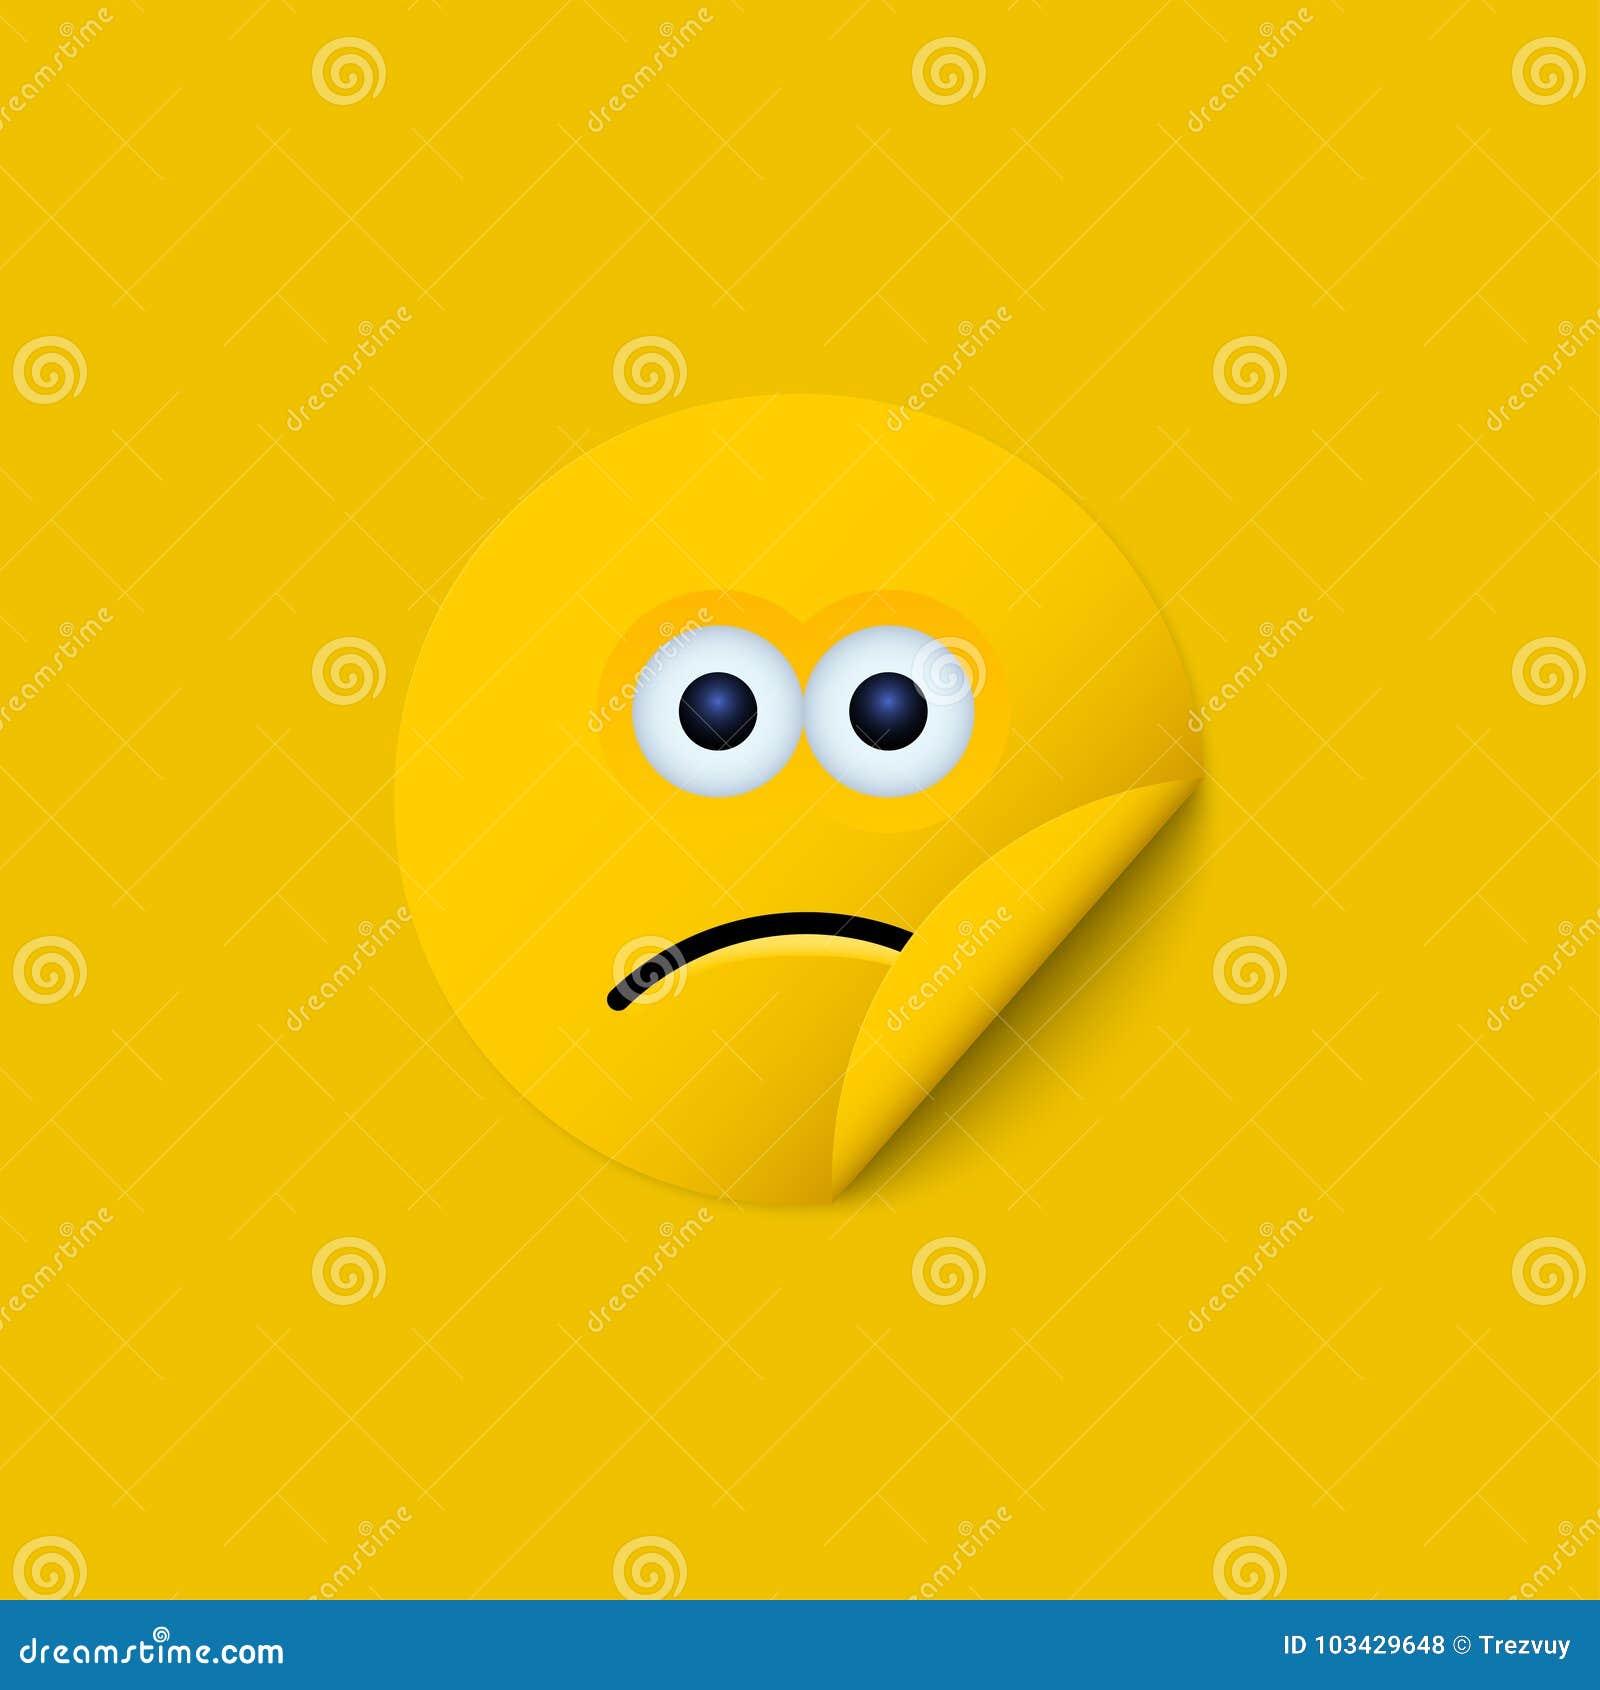 Vector modern yellow face sticker creative background.